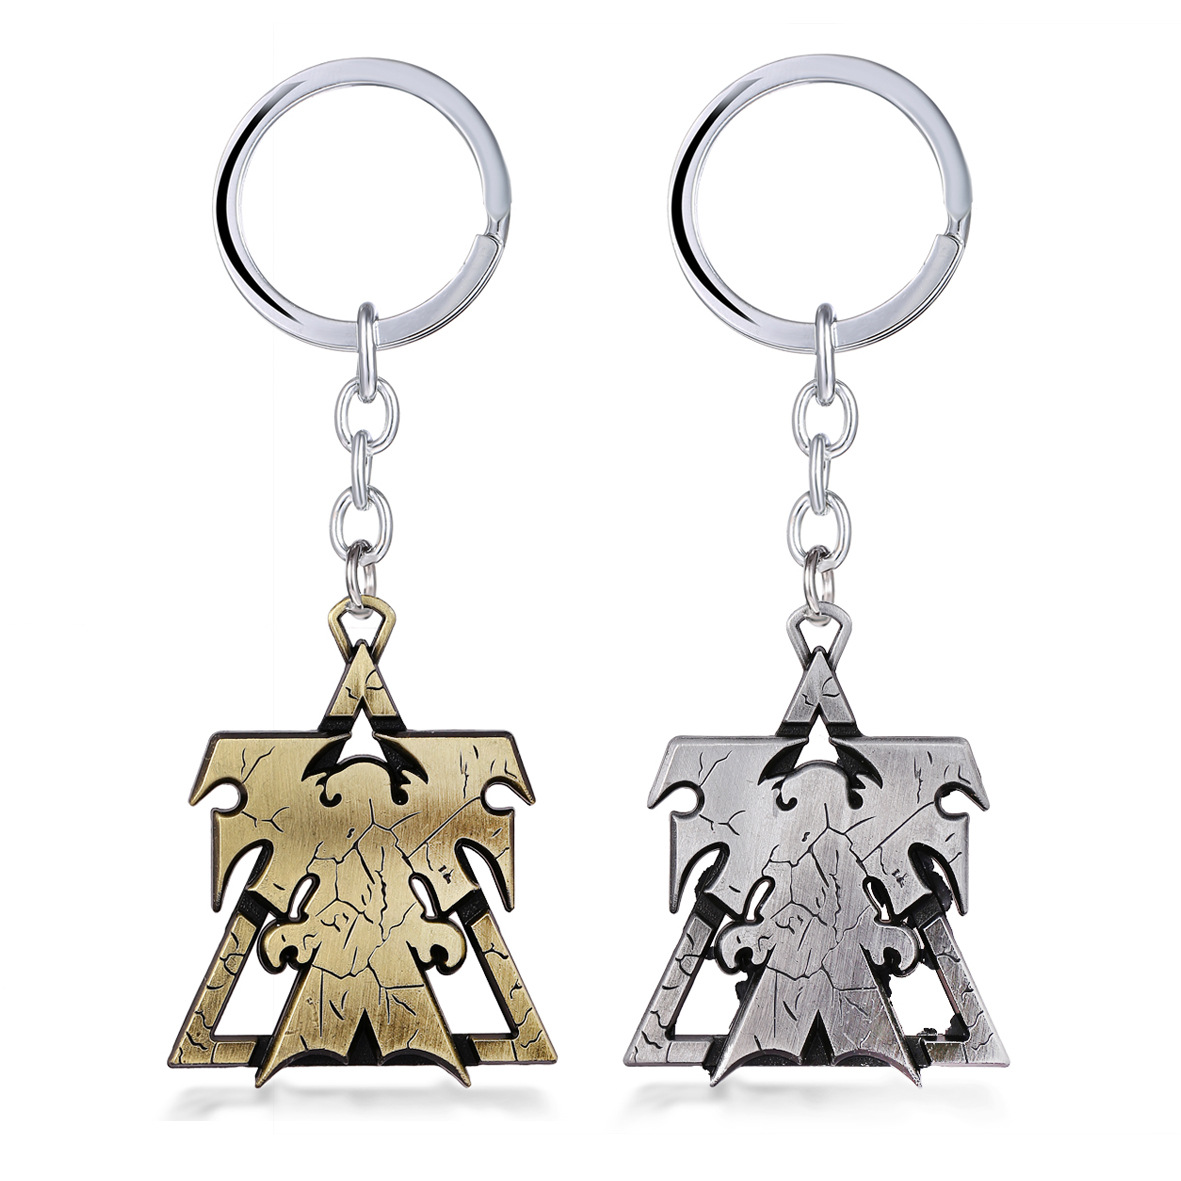 12pcs/lot Wholesale Zerg Protoss Keychain New Terran Key Chain Online Games Heart of the Swarm Carnival Souvenir Gift wholesale